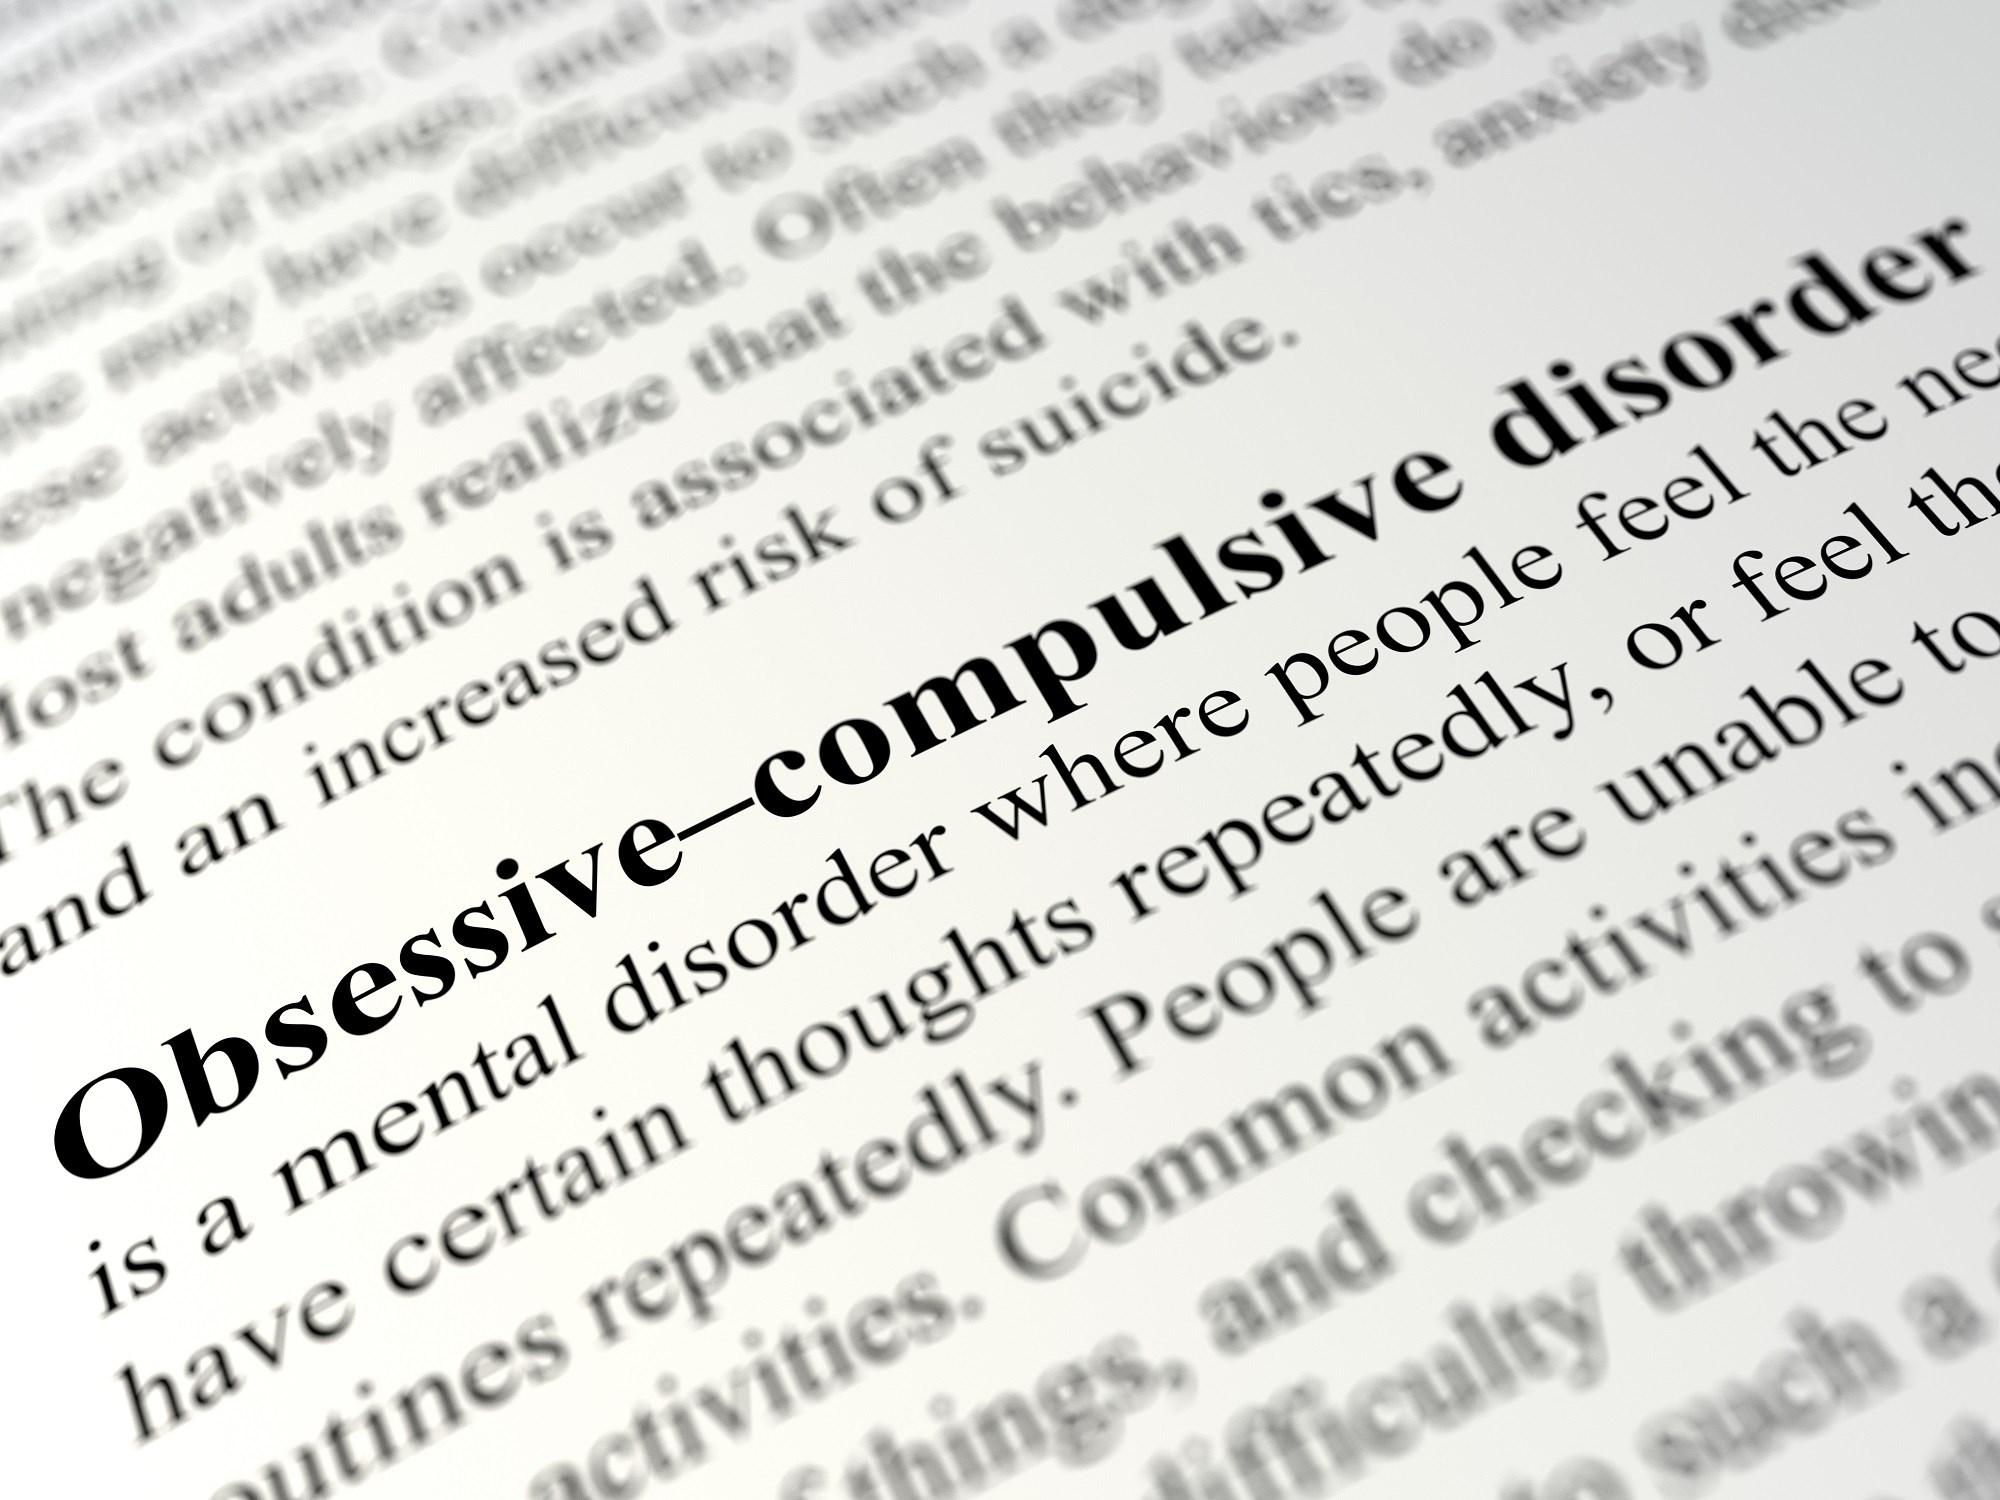 OCD Associated With Socioeconomic Factors and Mental Health Comorbidities